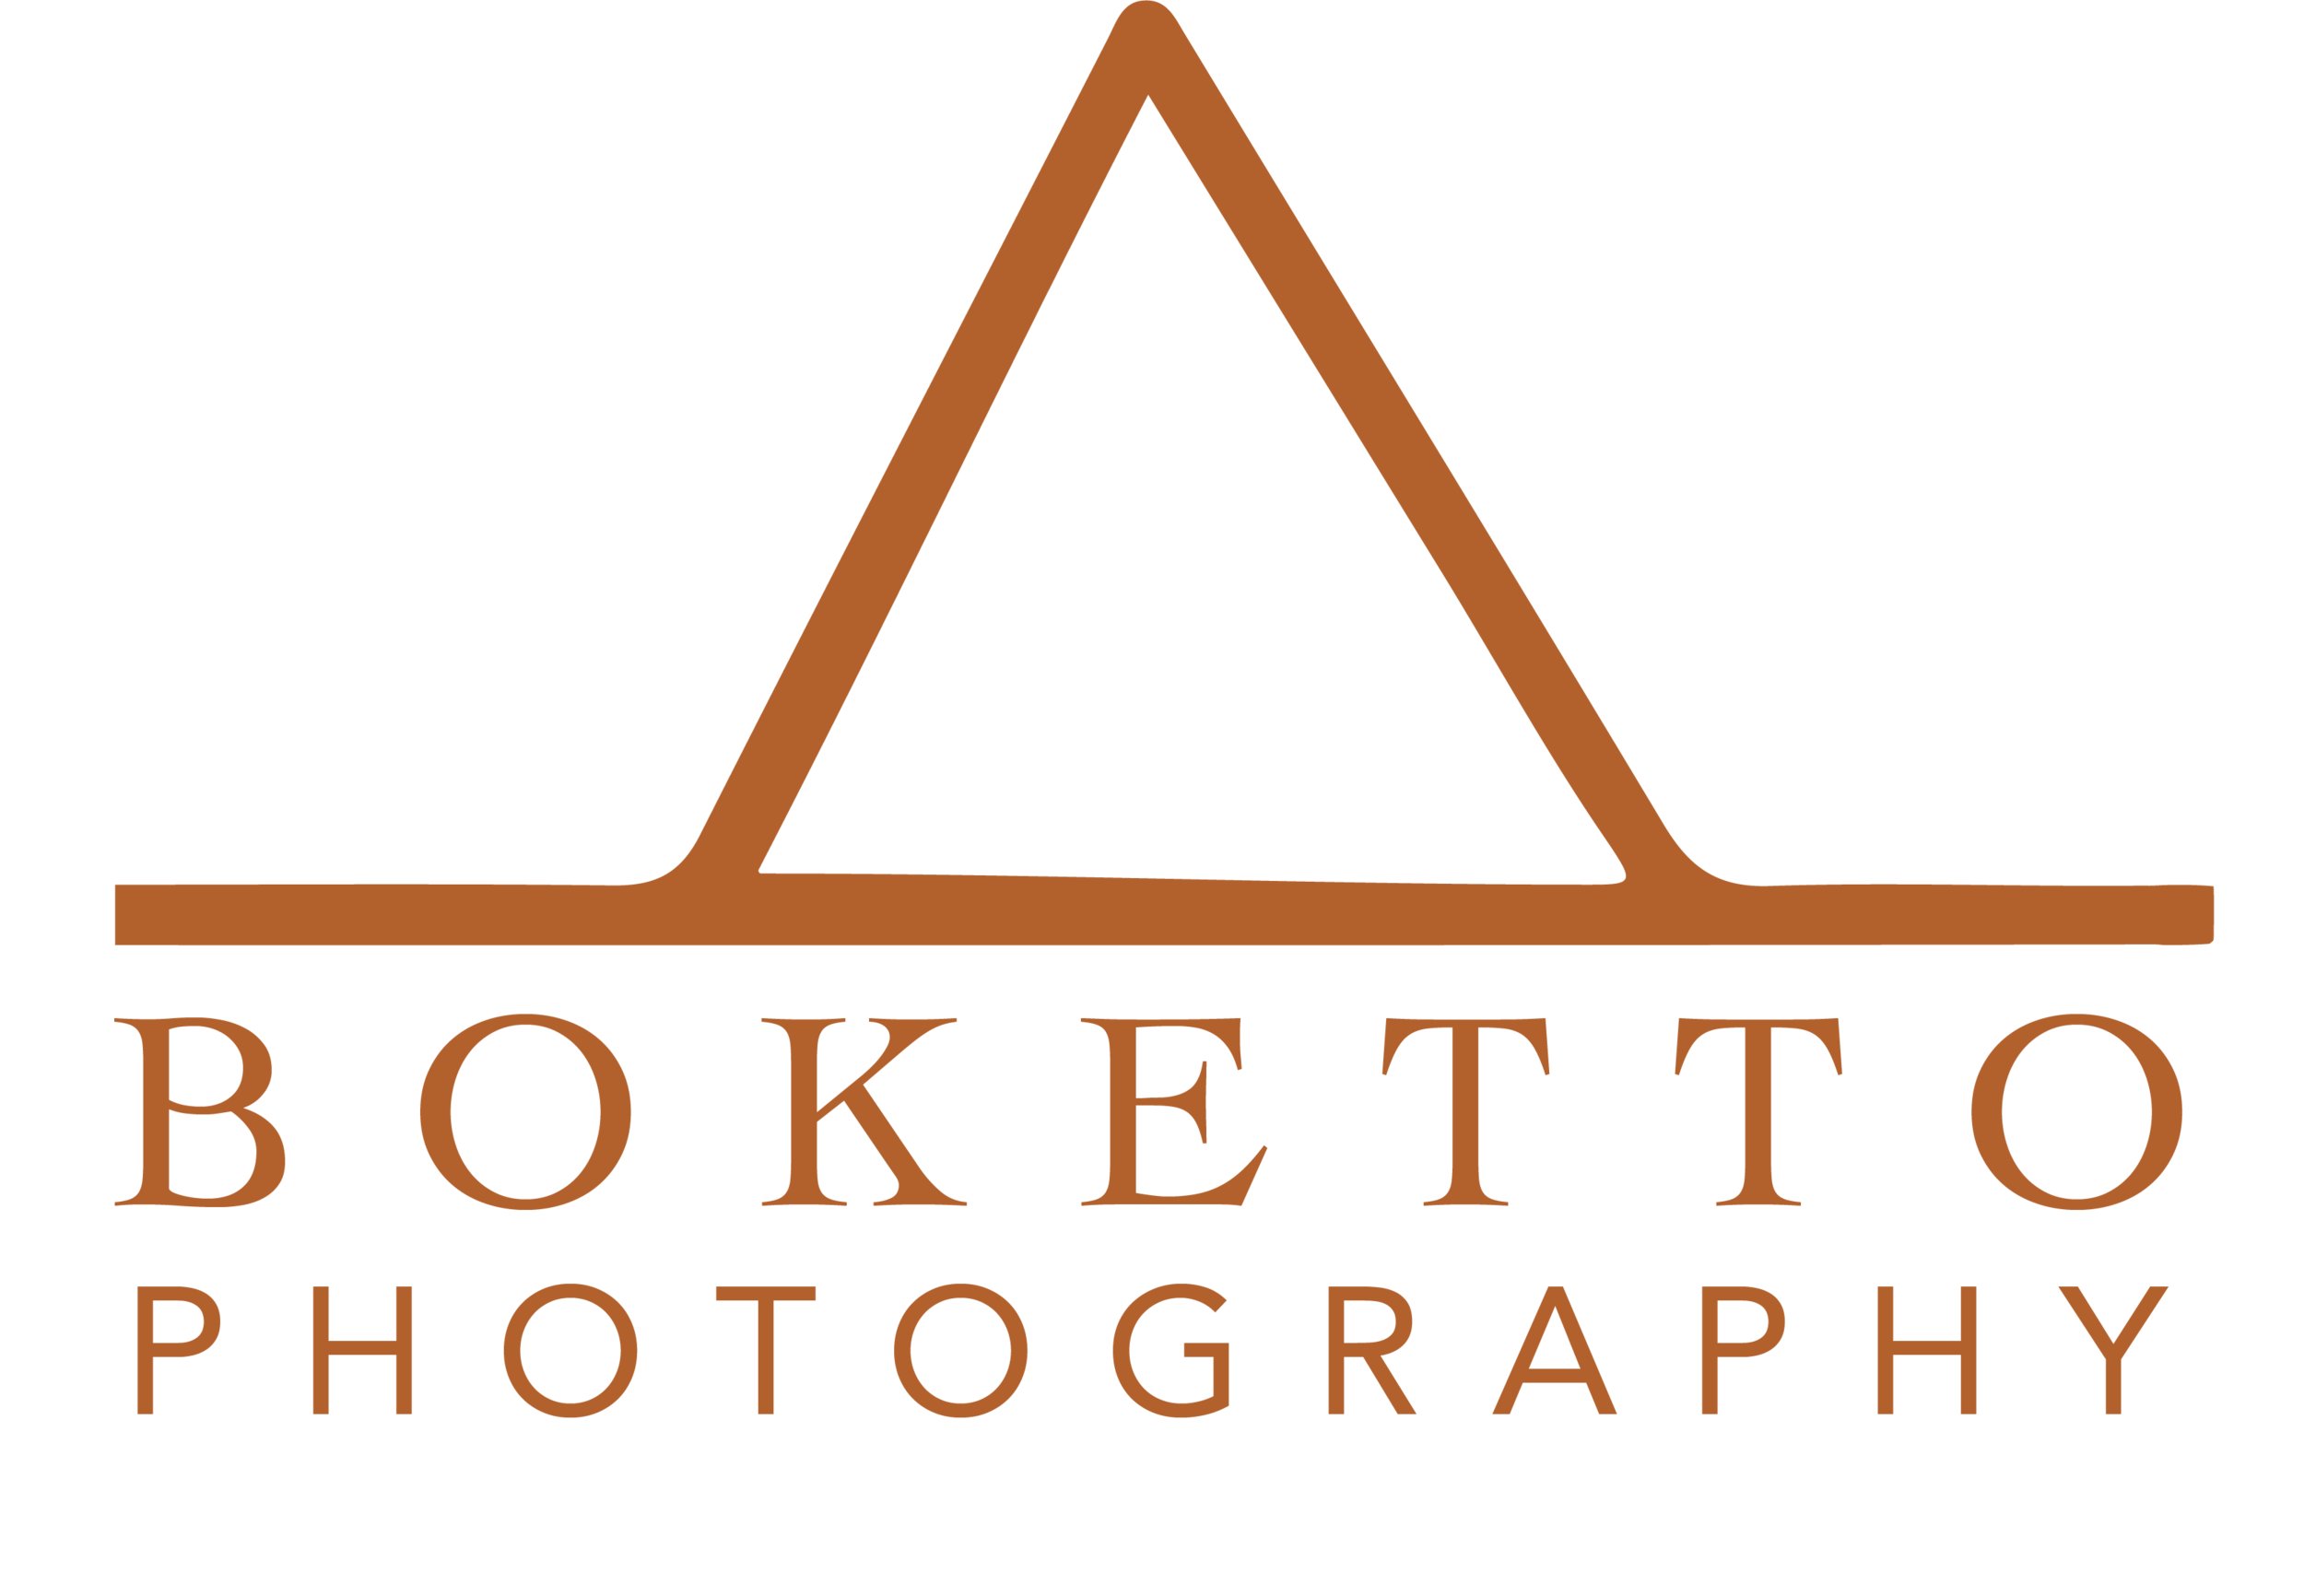 Boketto photography - Logo and ReBrand October 2018